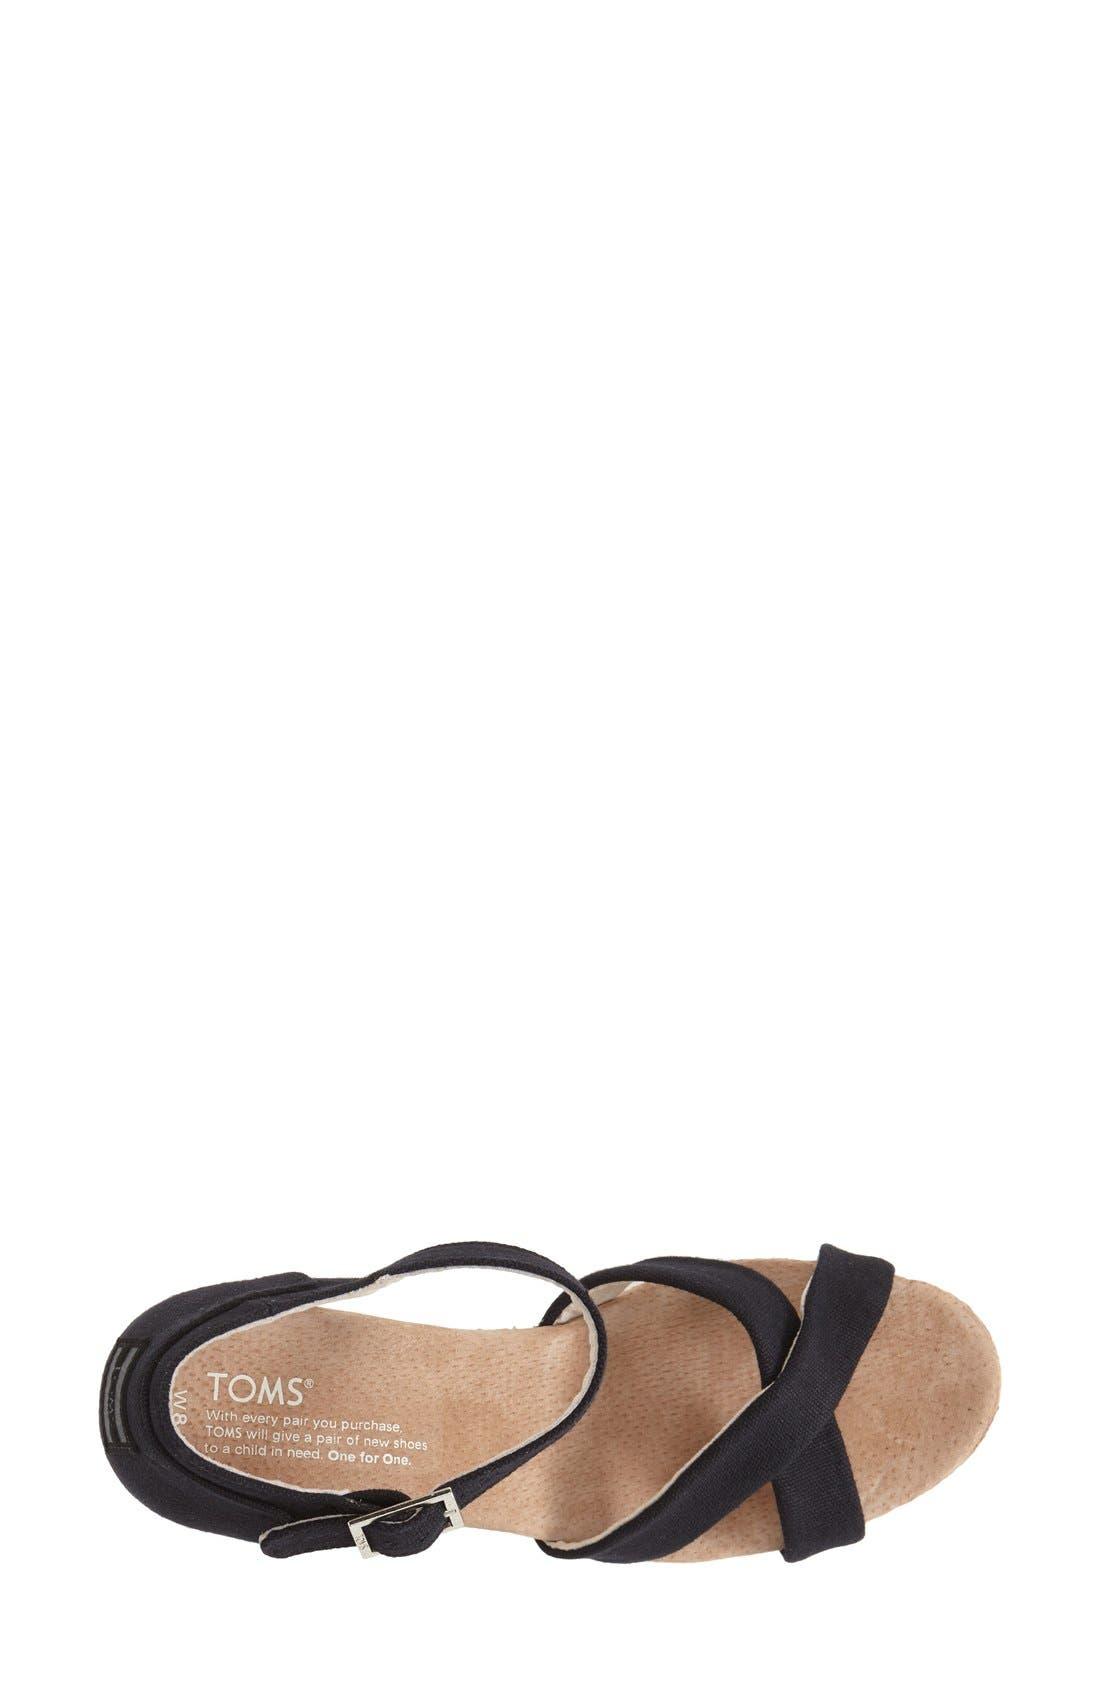 Alternate Image 3  - TOMS Canvas Ankle Strap Wedge Sandal (Women)